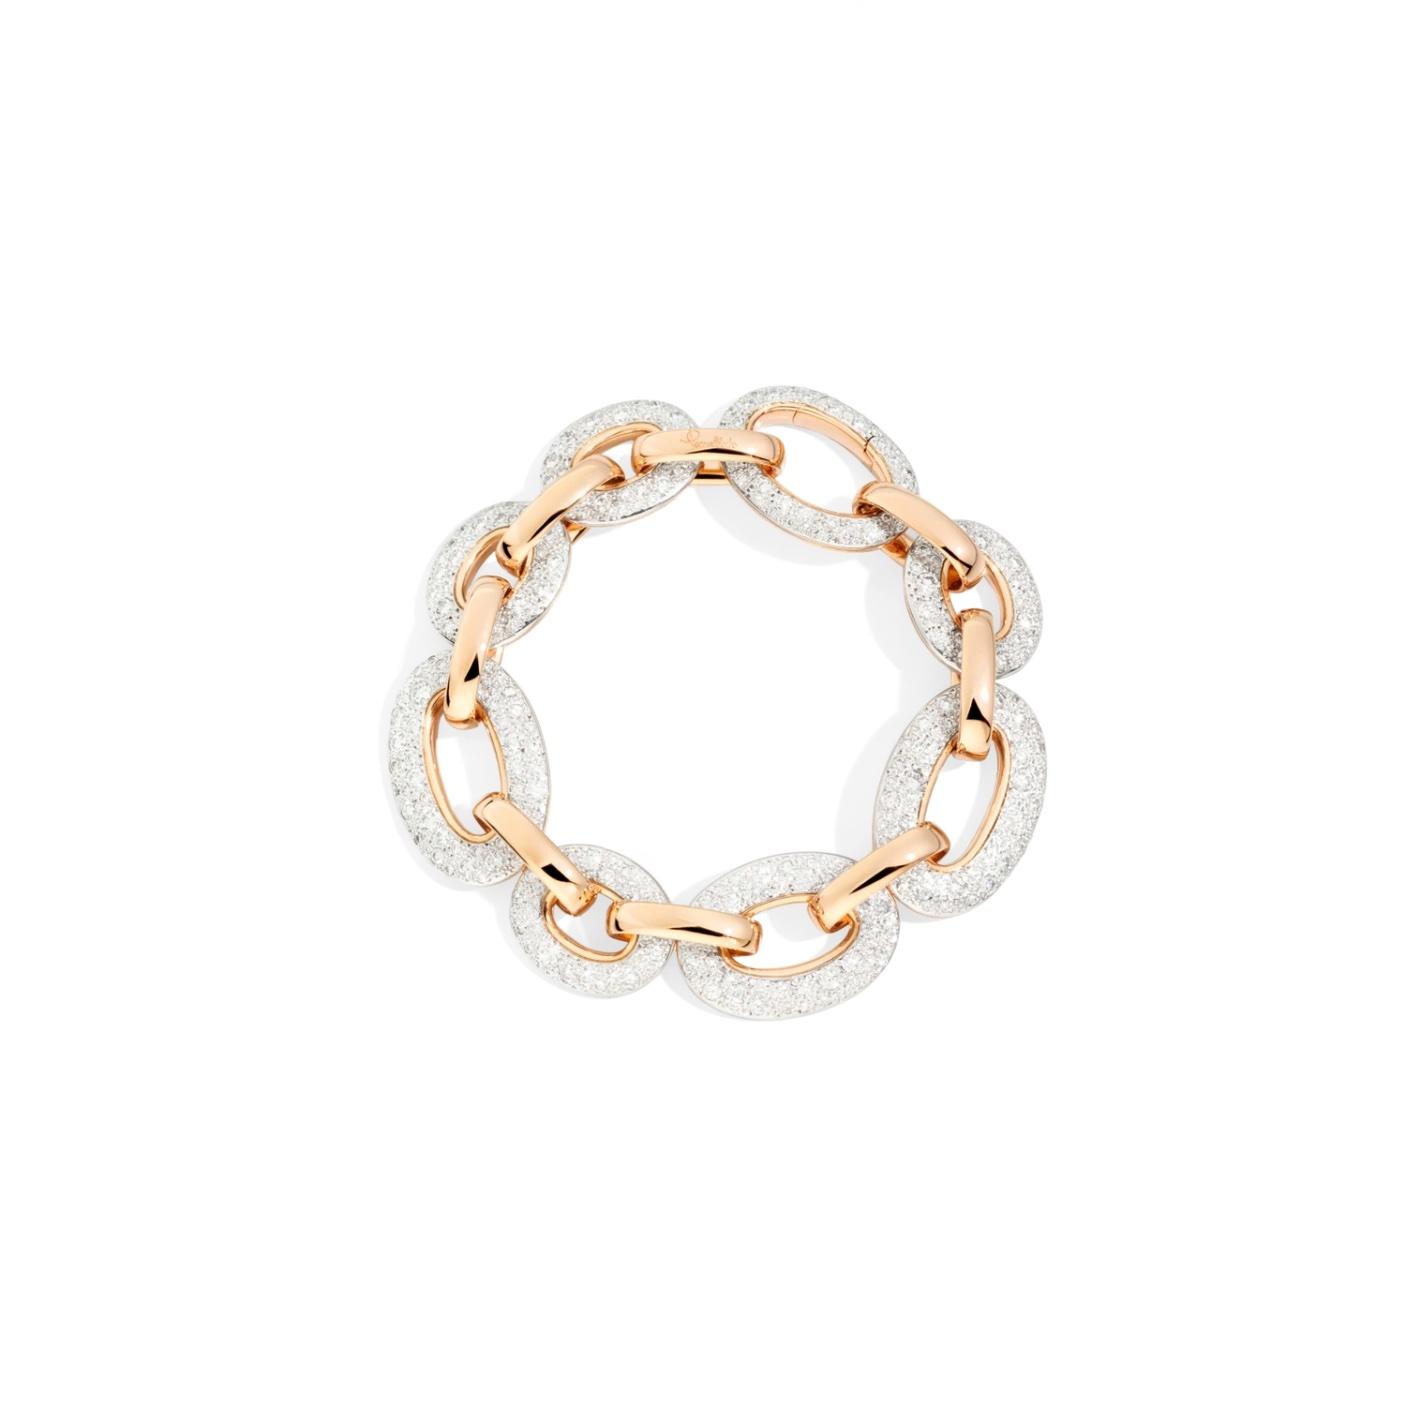 Pomellato Pomellato Tango Catene armband in 18 krt. roségoud met witte diamanten